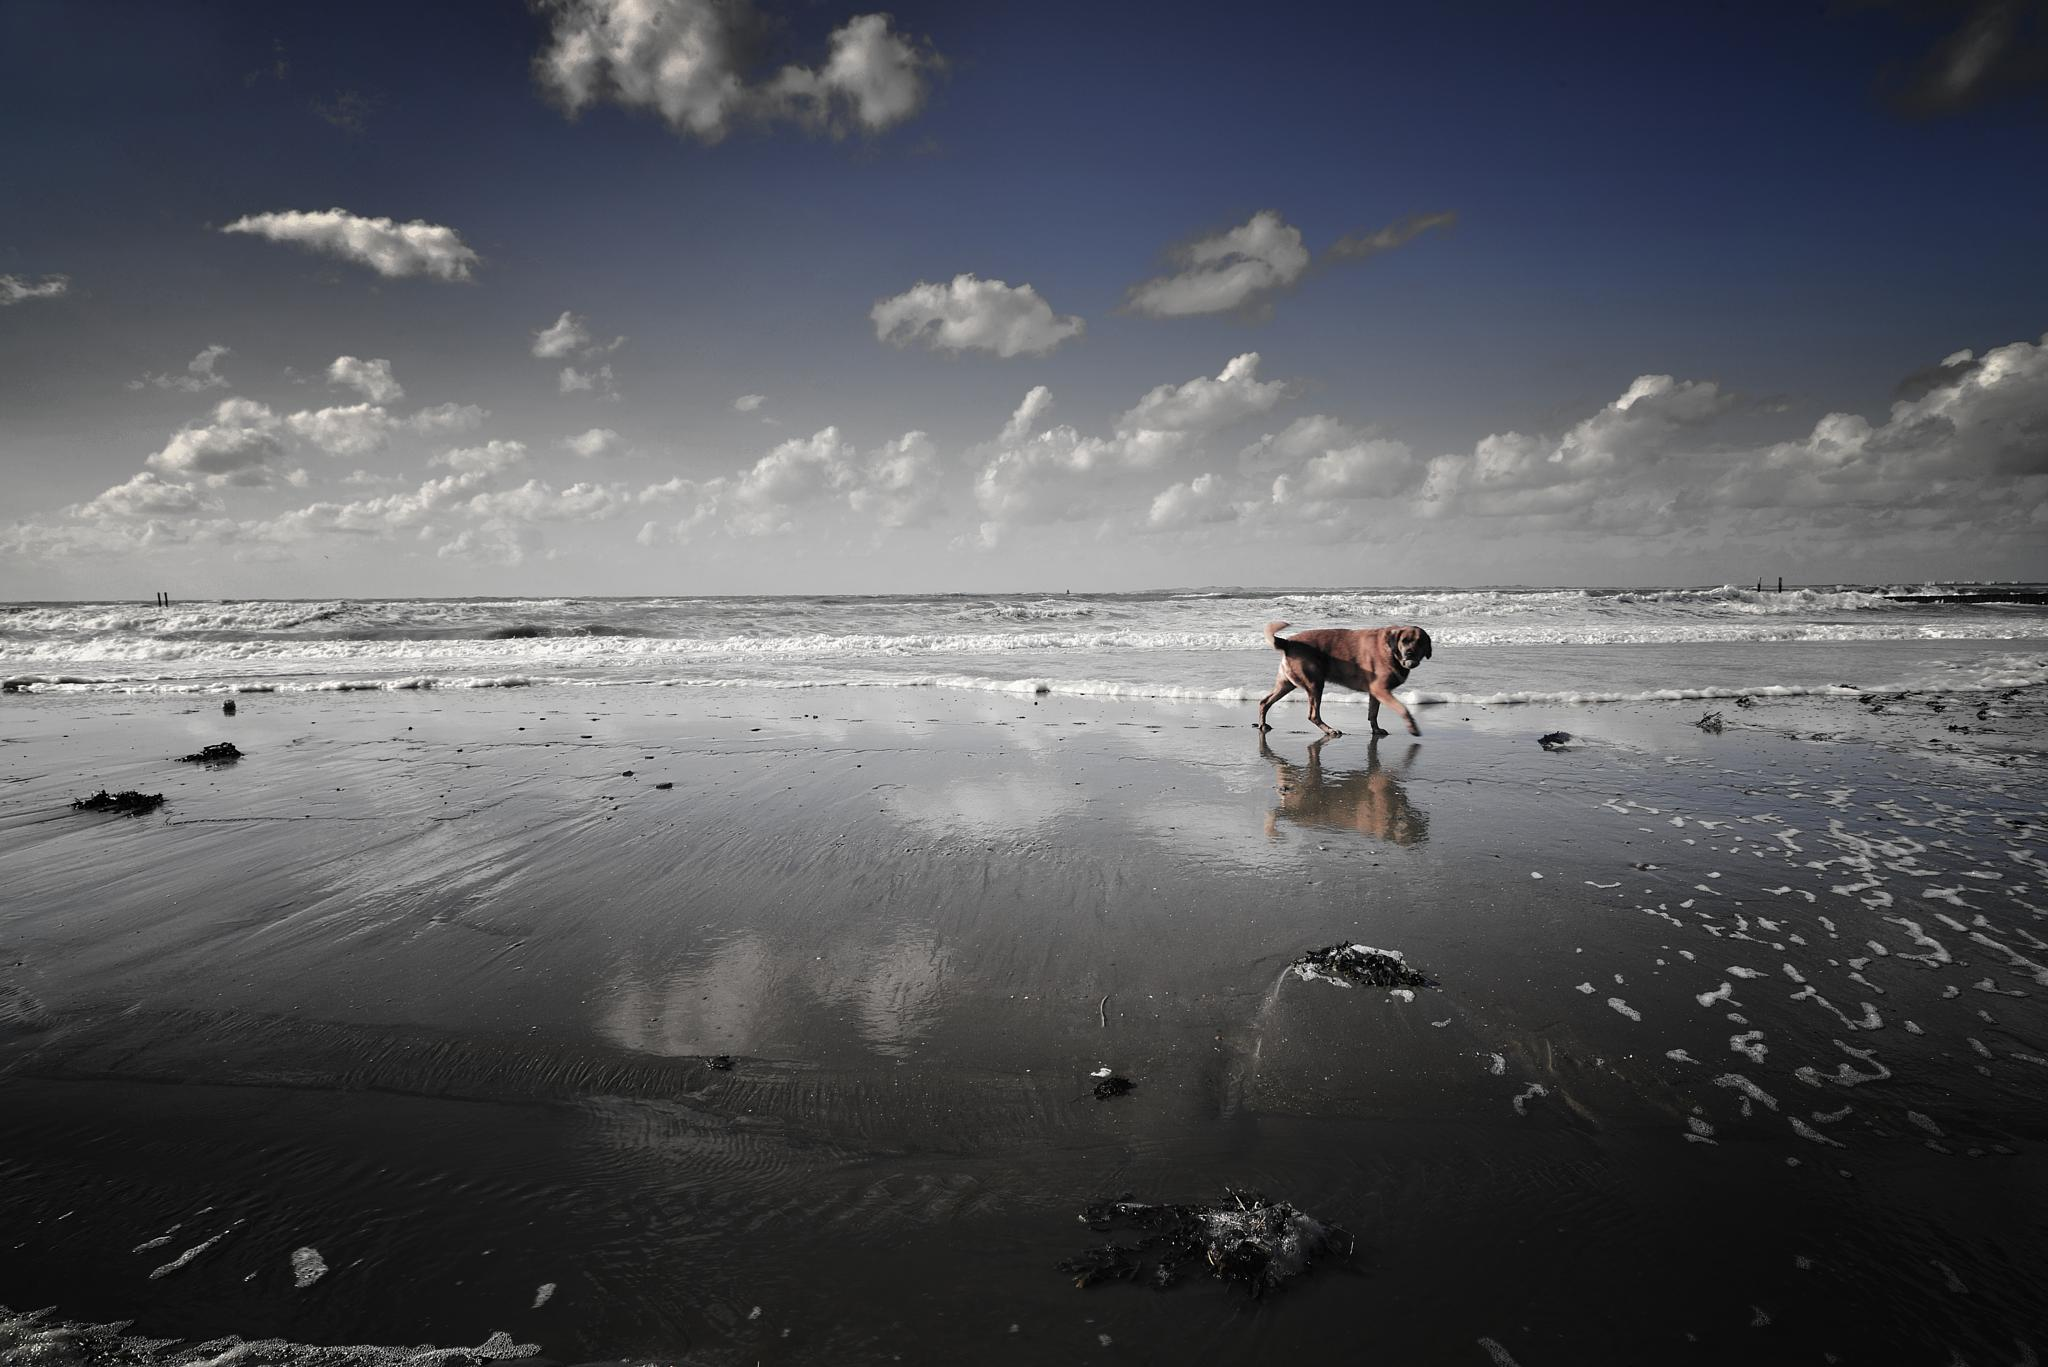 Alone  by Rudi.Fonteijne